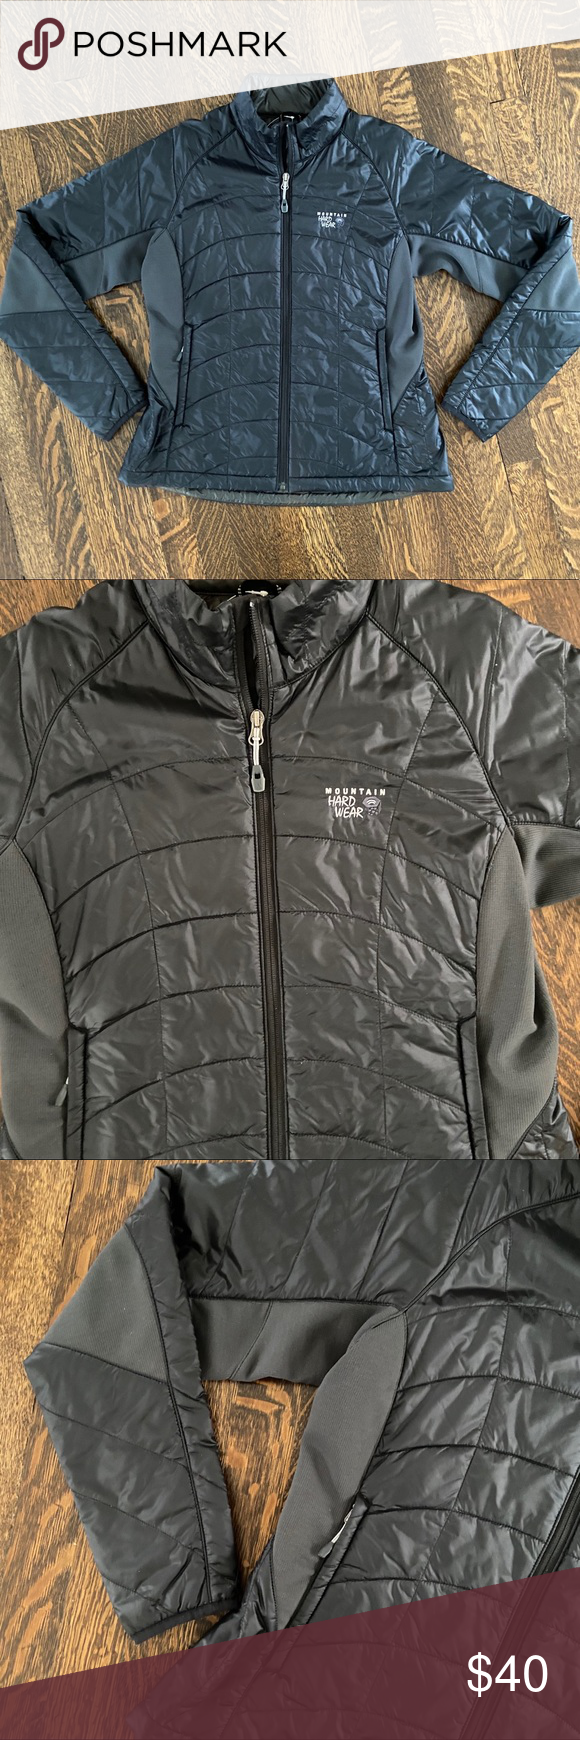 Women S Mountain Hardware Medium Black Jacket Excellent Condition Black Mountain Hardware Jacket Women S Size Medium Black Jacket Jackets Jackets For Women [ 1740 x 580 Pixel ]